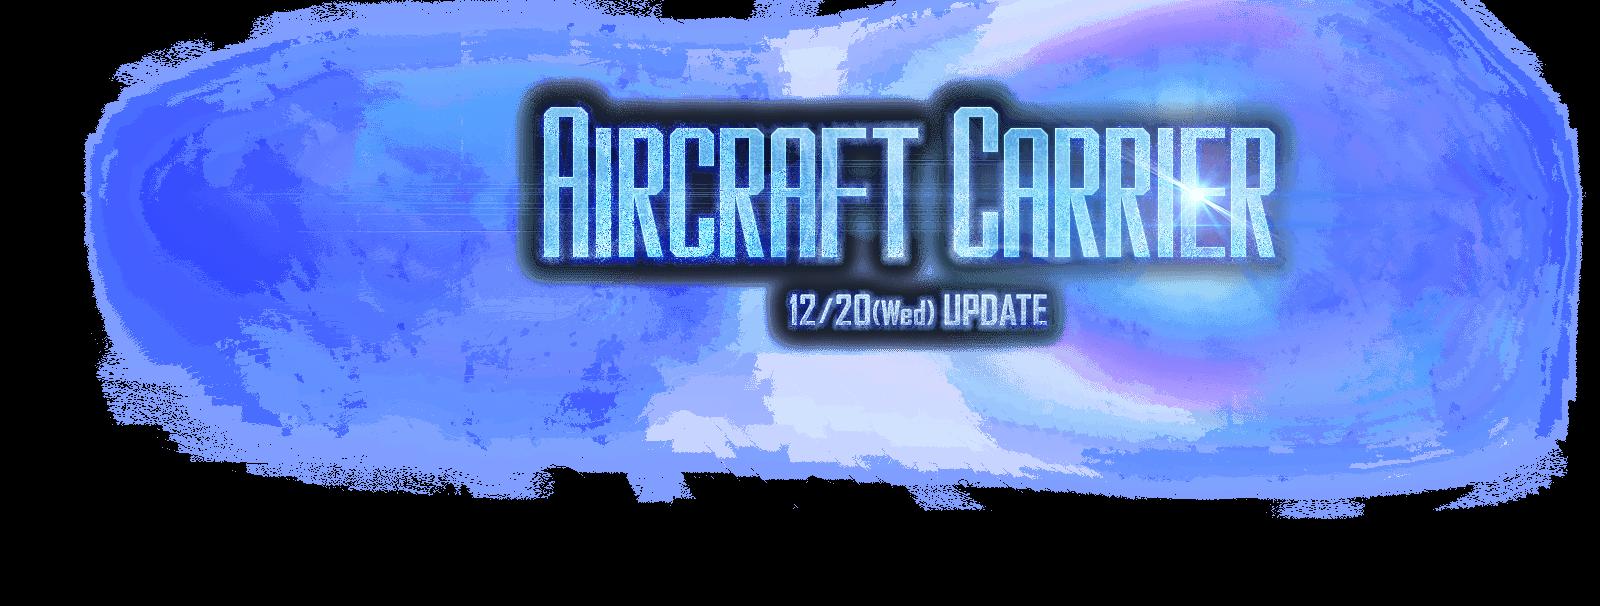 AIRCRAFT CARRIER 12/20(Wed)UPDATE